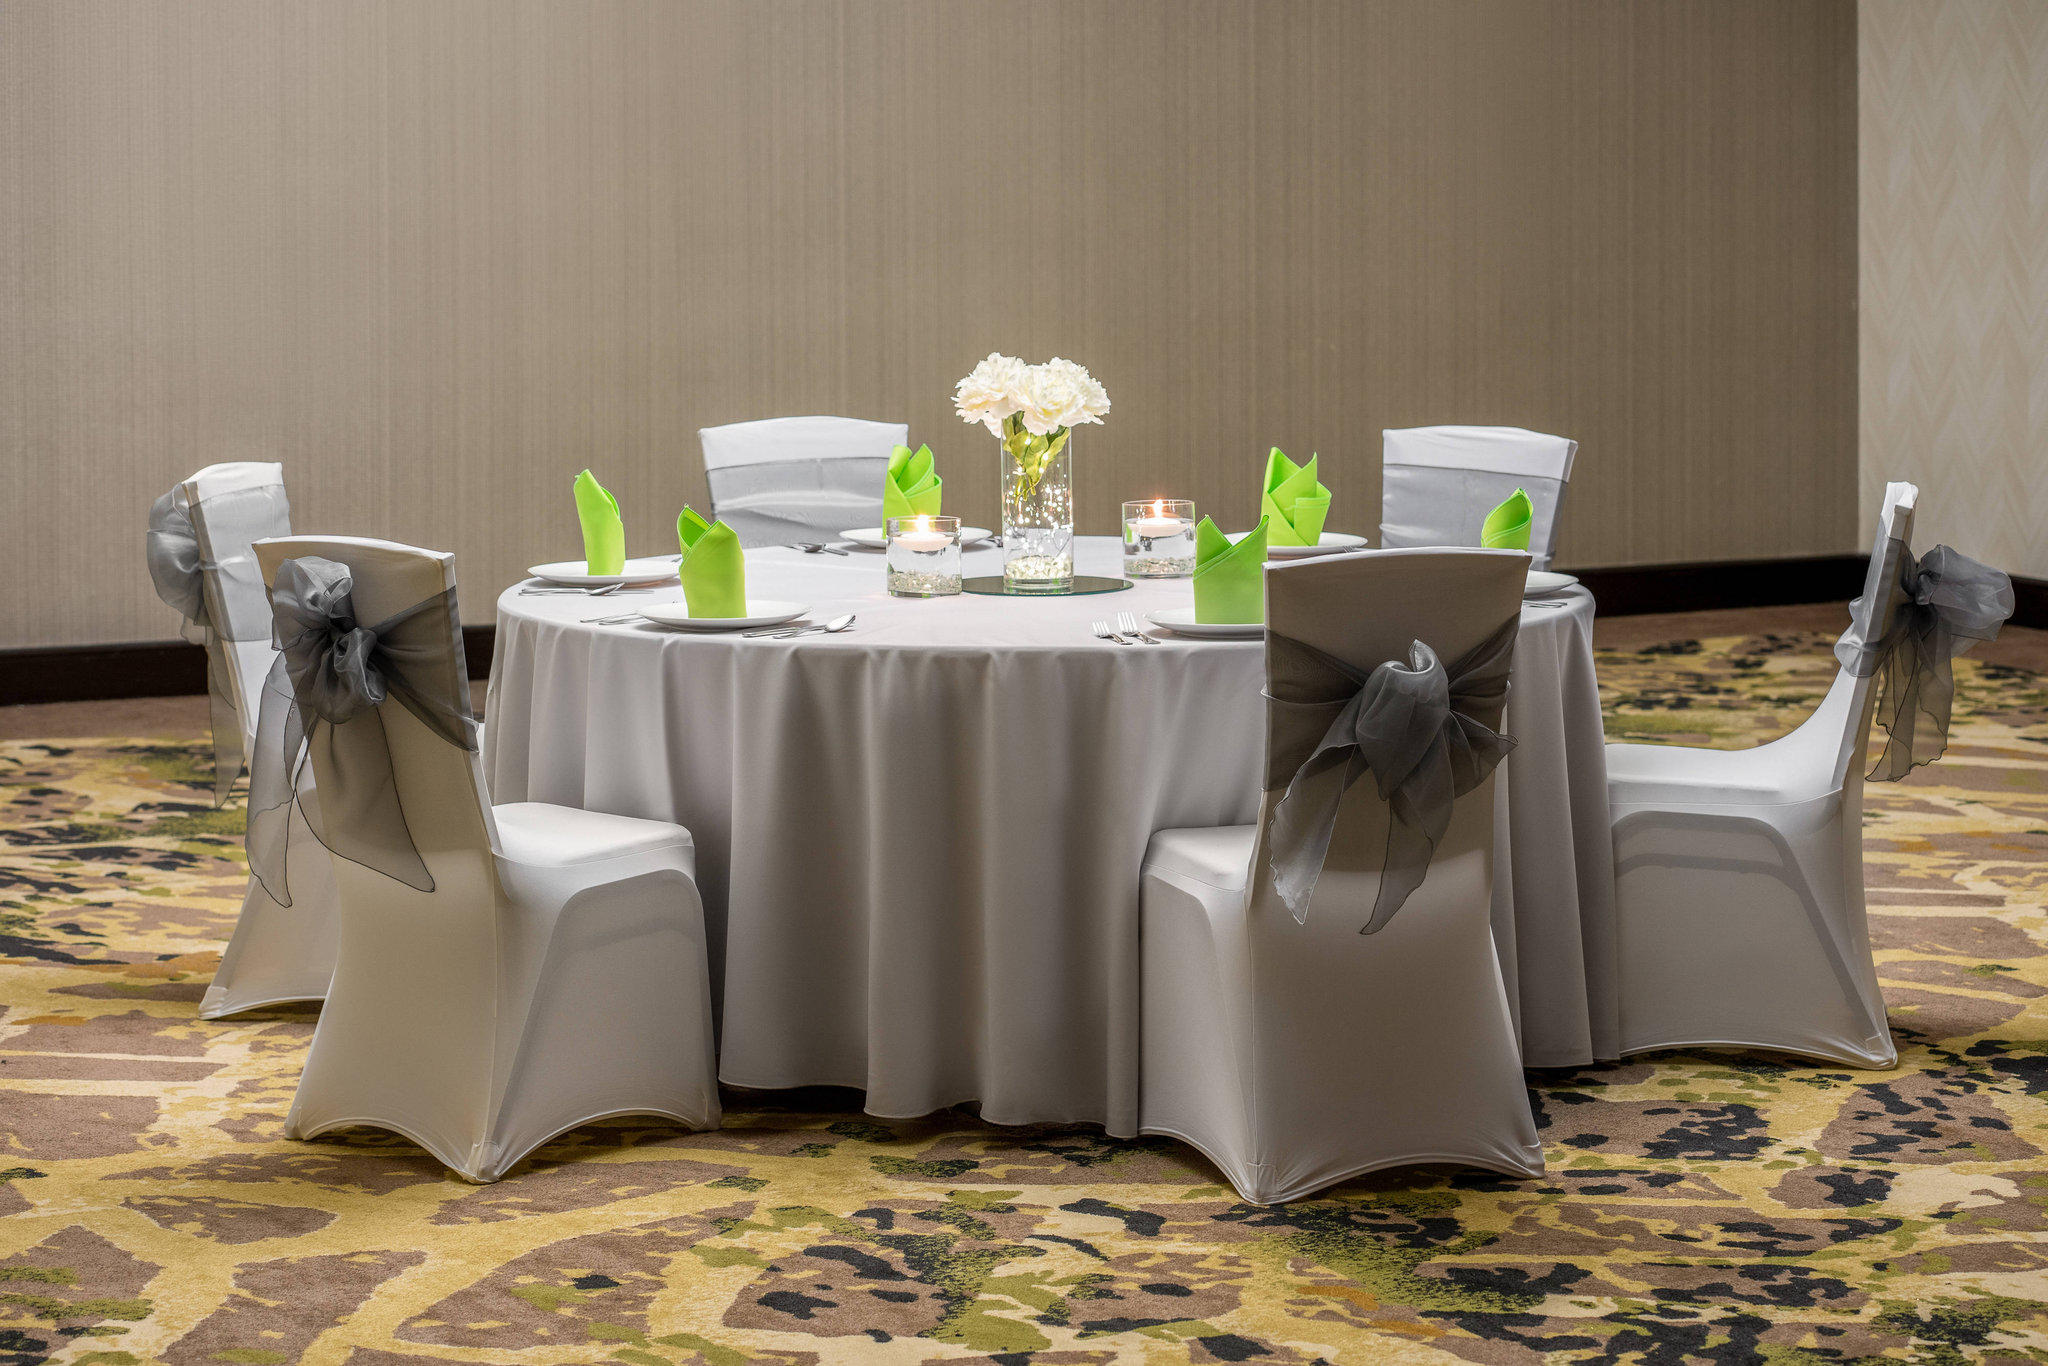 SpringHill Suites by Marriott Denton